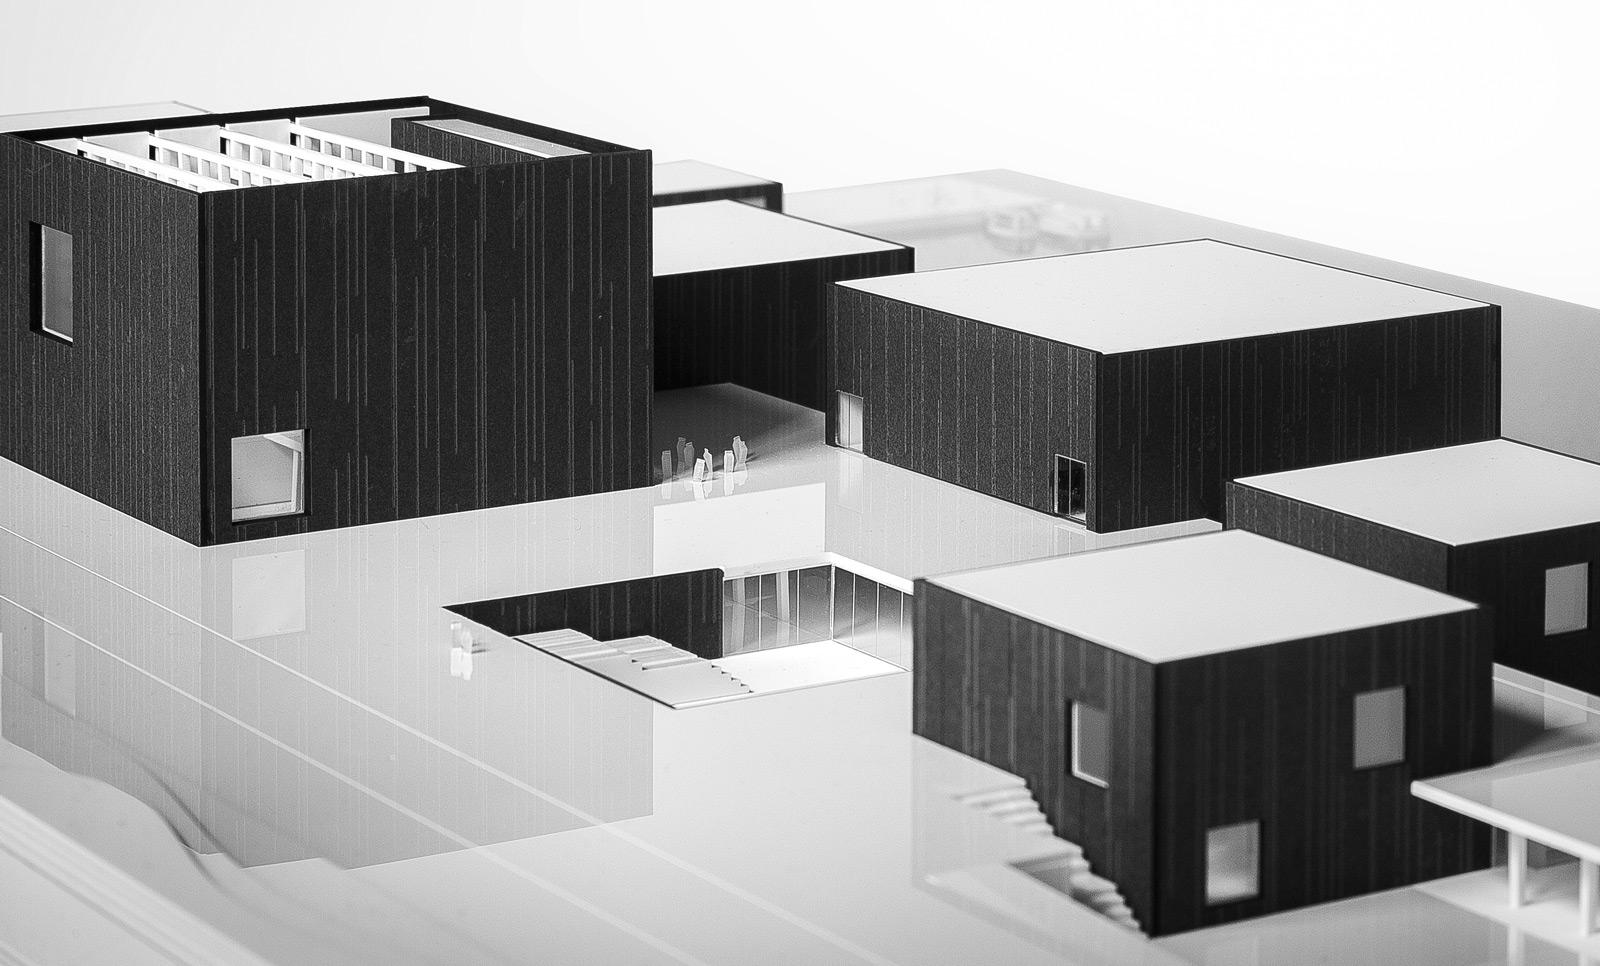 maqueta-arquitectura-valencia-arquiayuda-arquimaqueta-museo-fluvial-en-oporto-architecture-model (2)